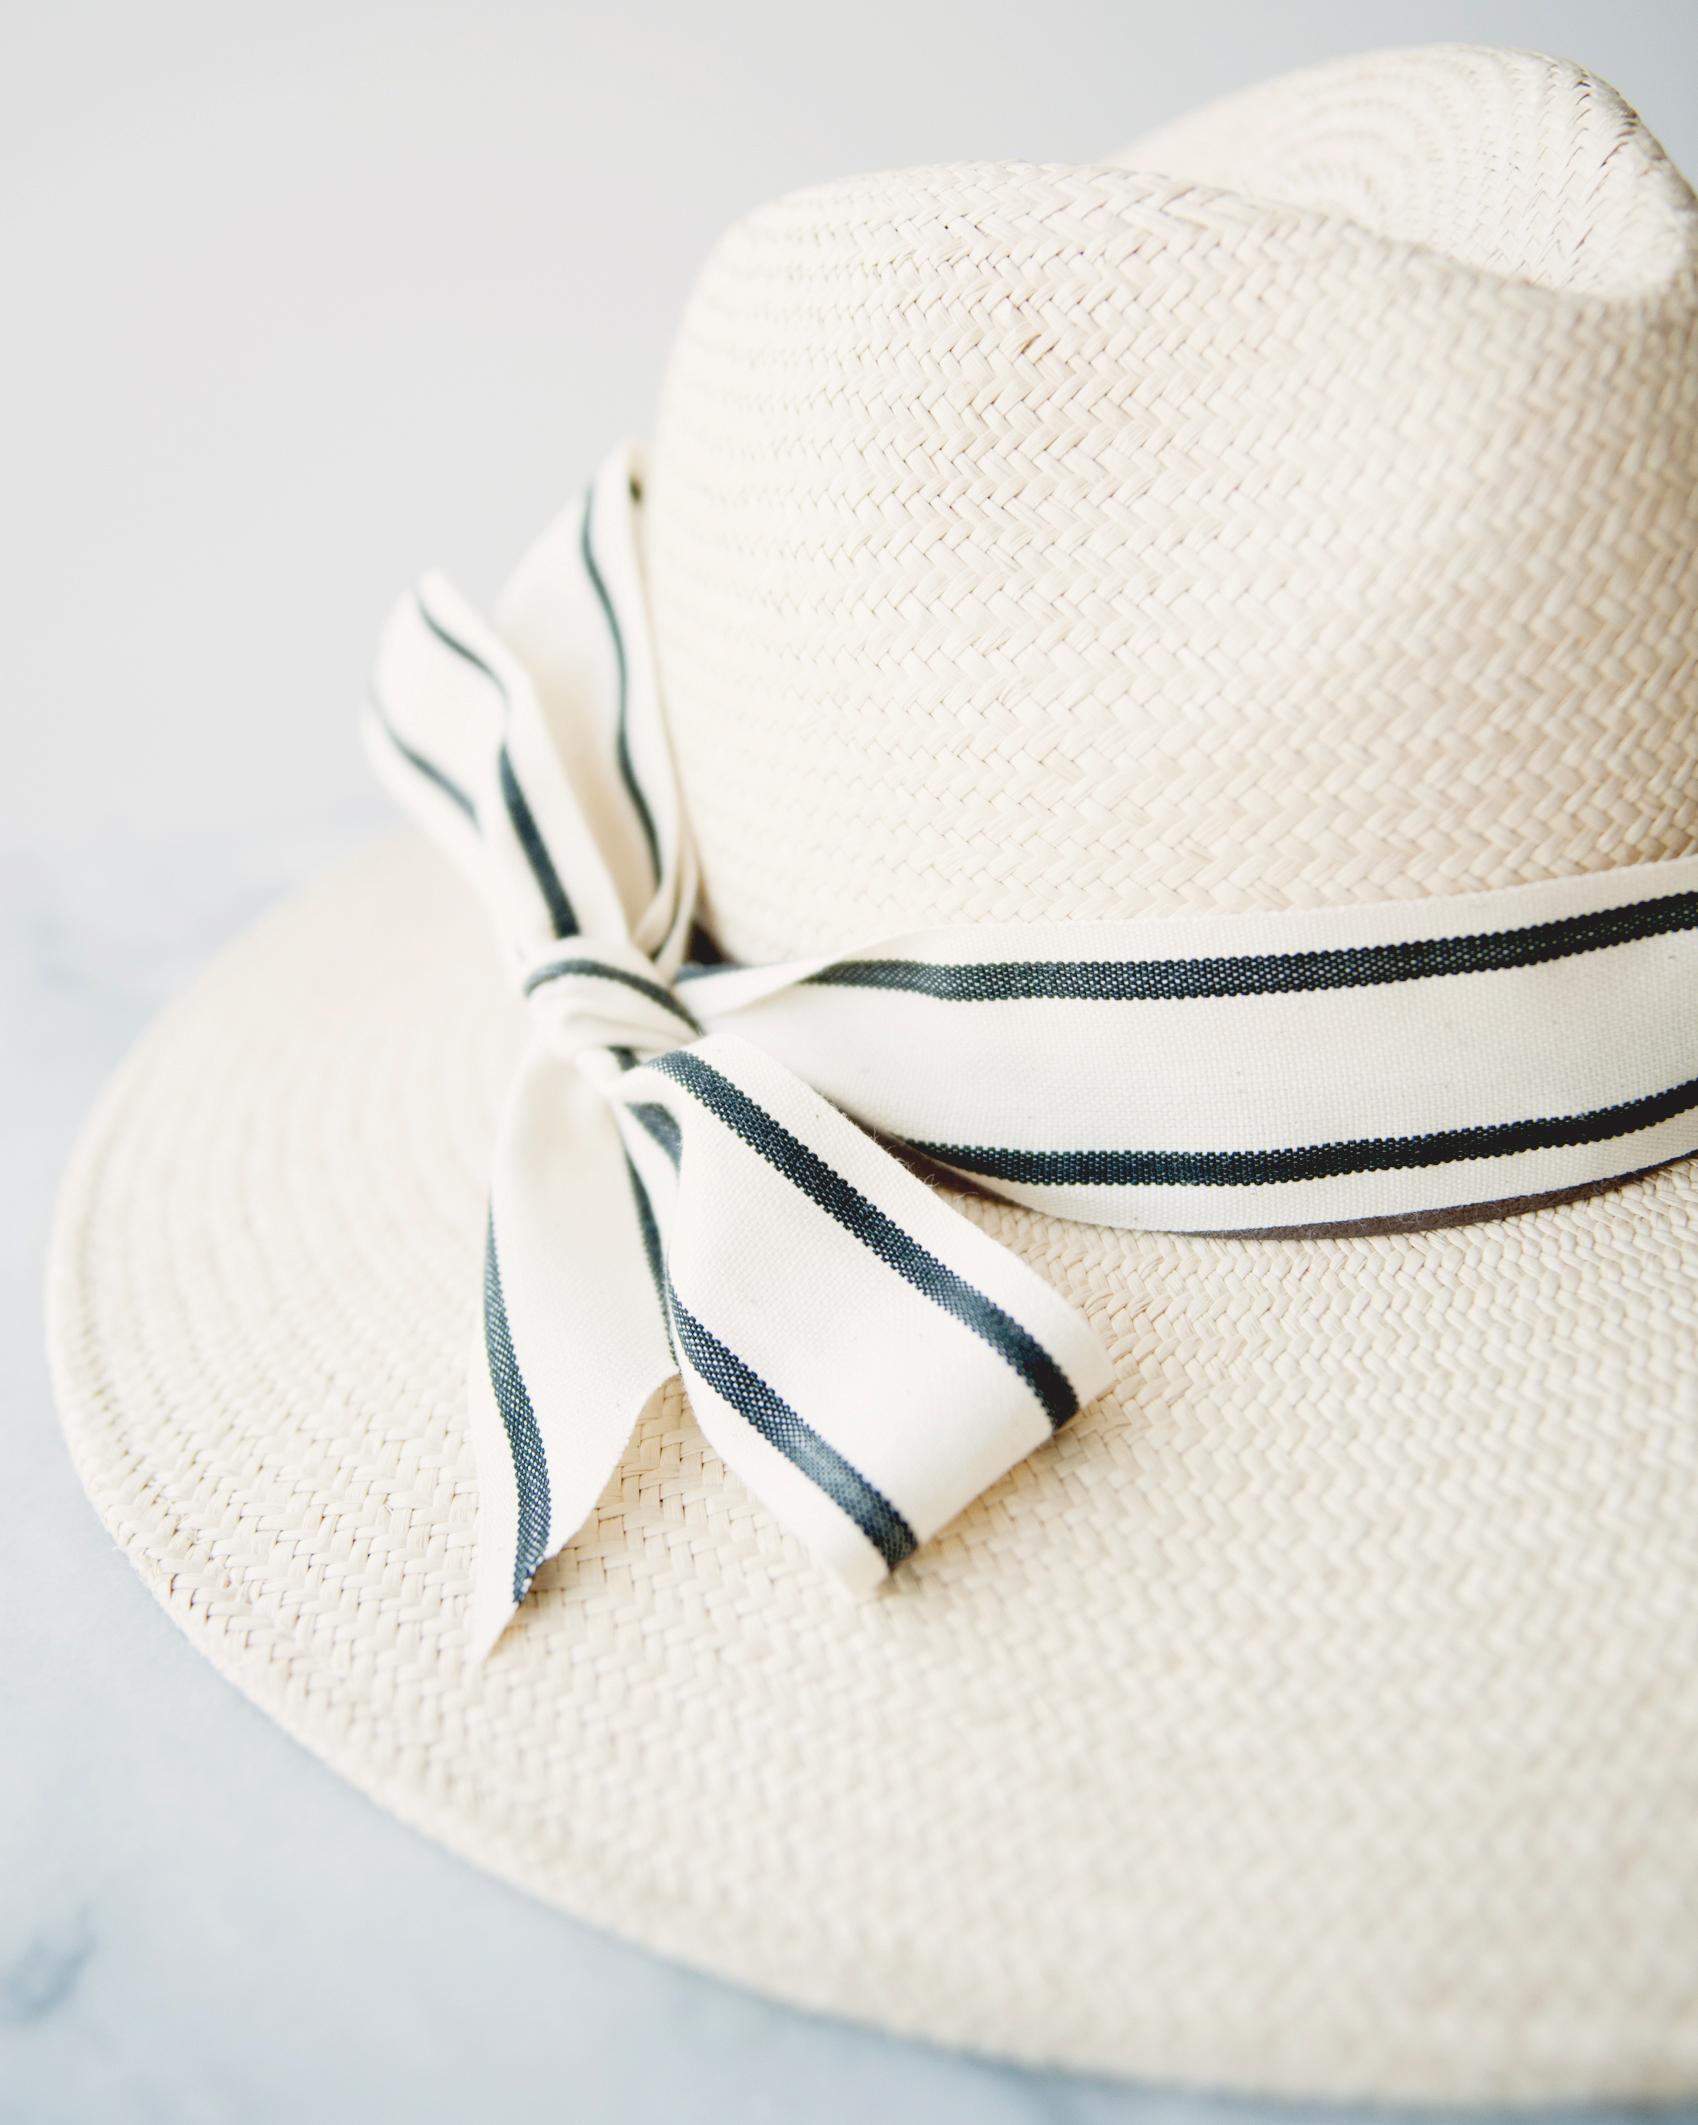 claire-thomas-bridal-shower-derby-diy-hat-ribbon-0814.jpg